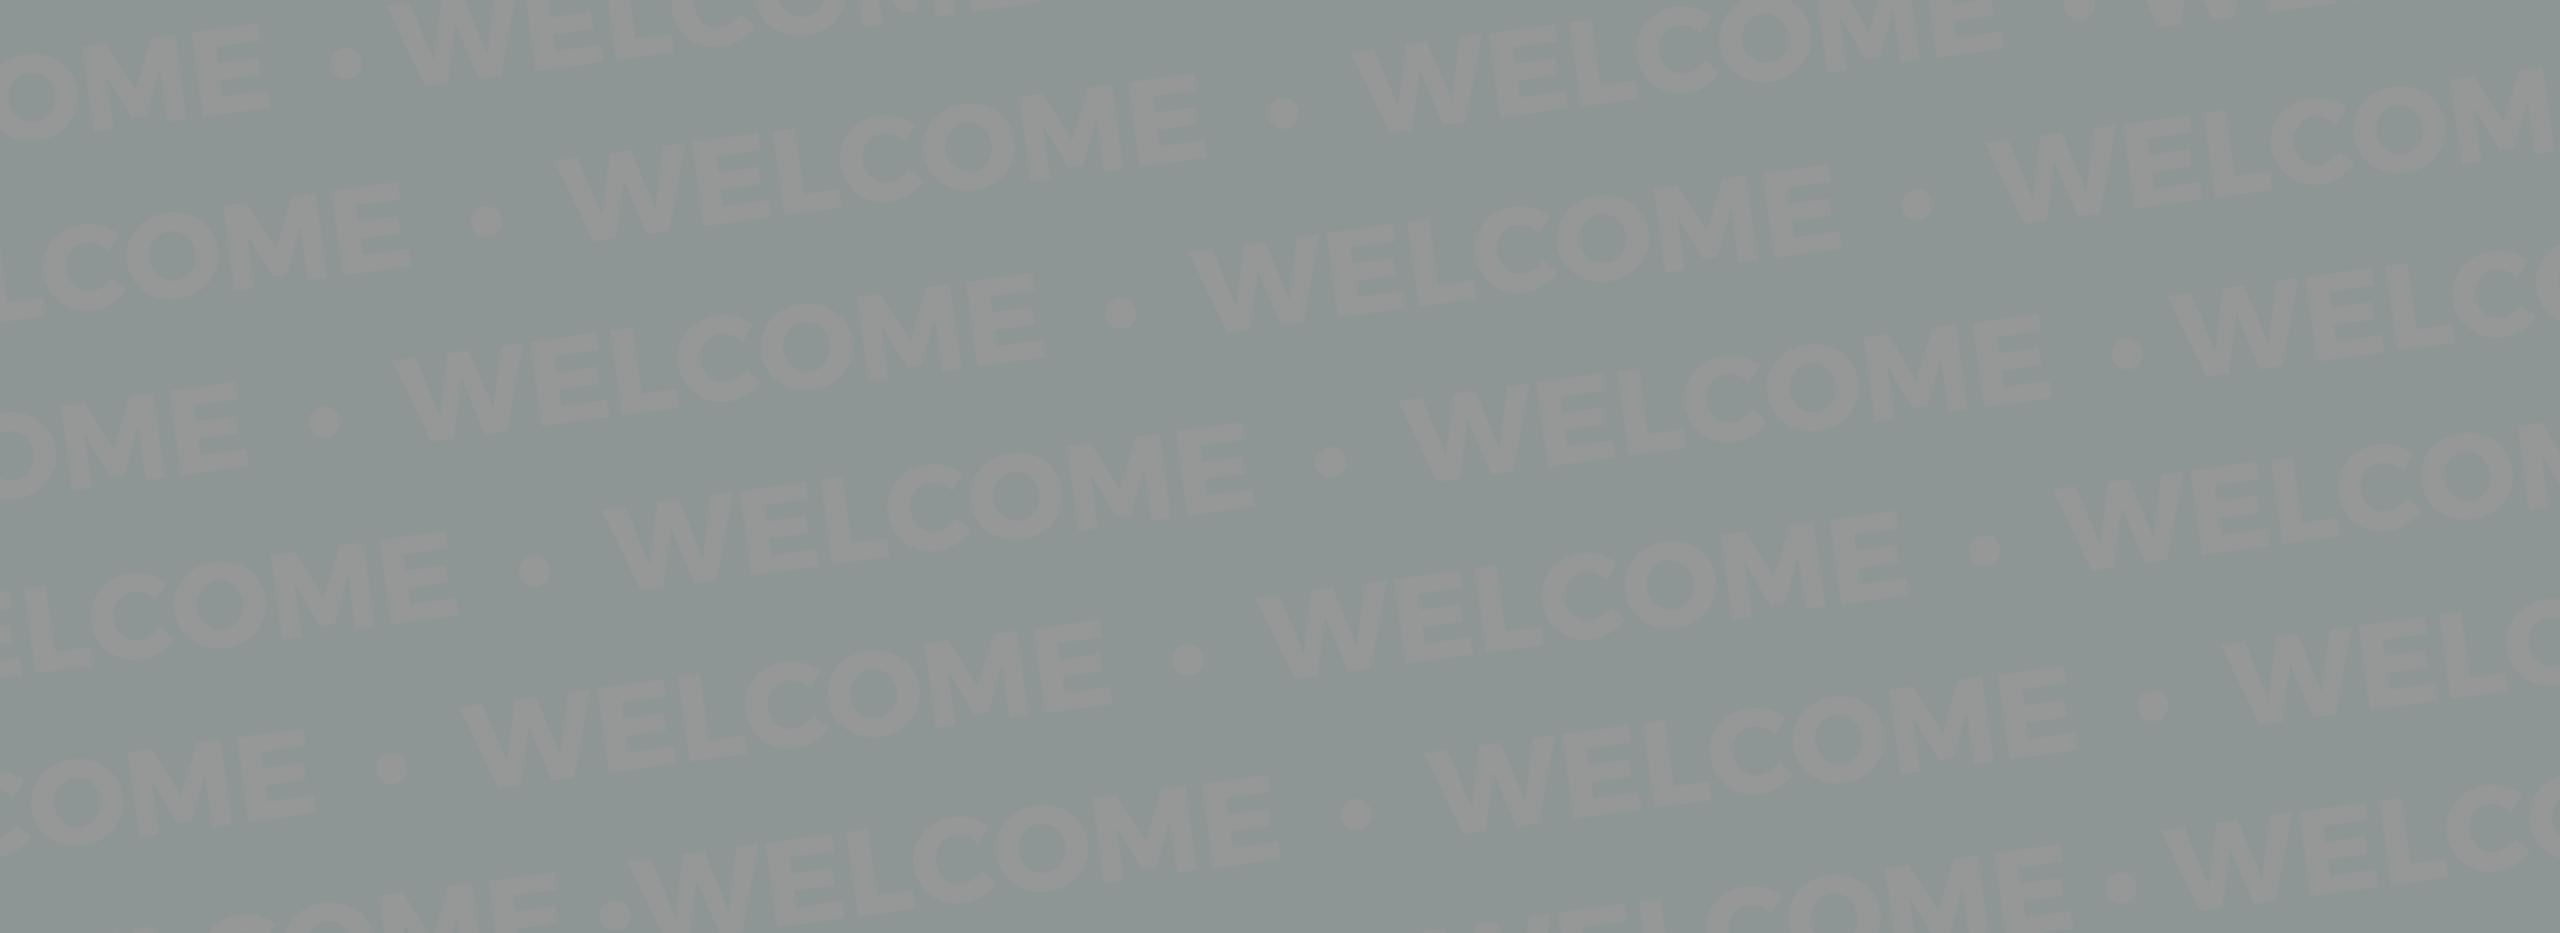 MRE | AP Welcomes New Agent Maureen Conroy Britell